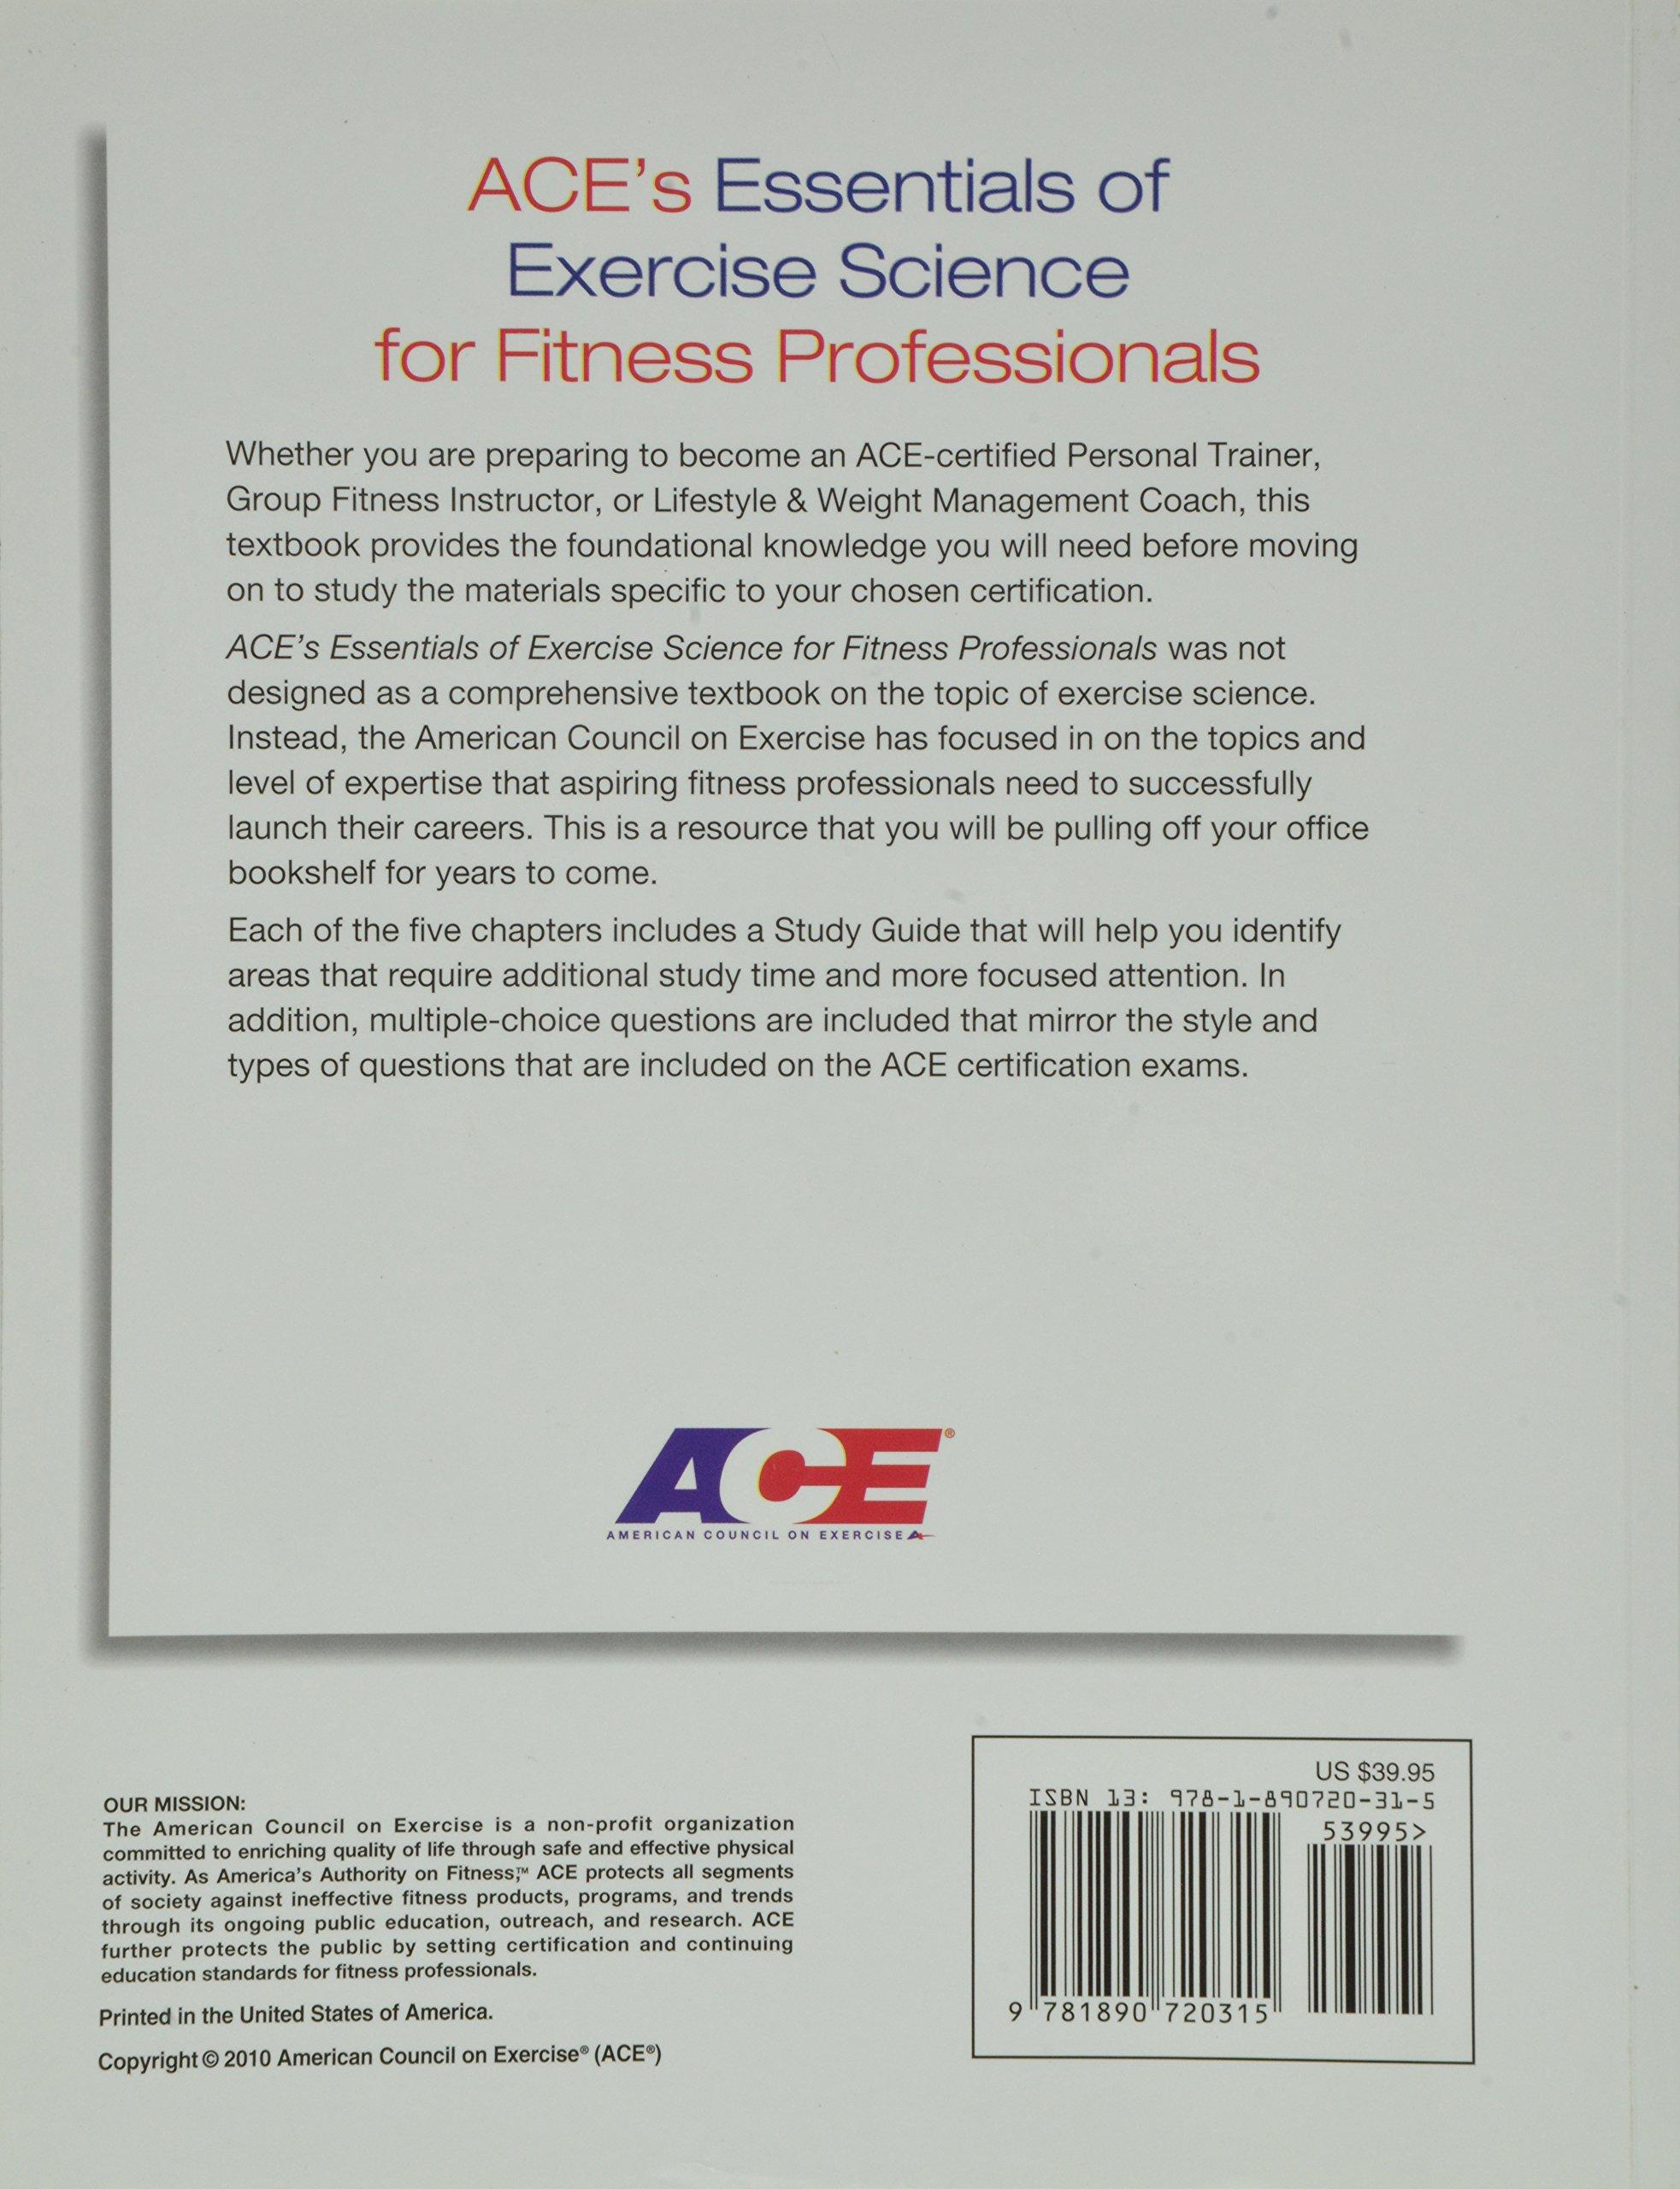 Essentials of Exercise Science: AM.COUNCIL EX.: 9781890720315: Amazon.com:  Books